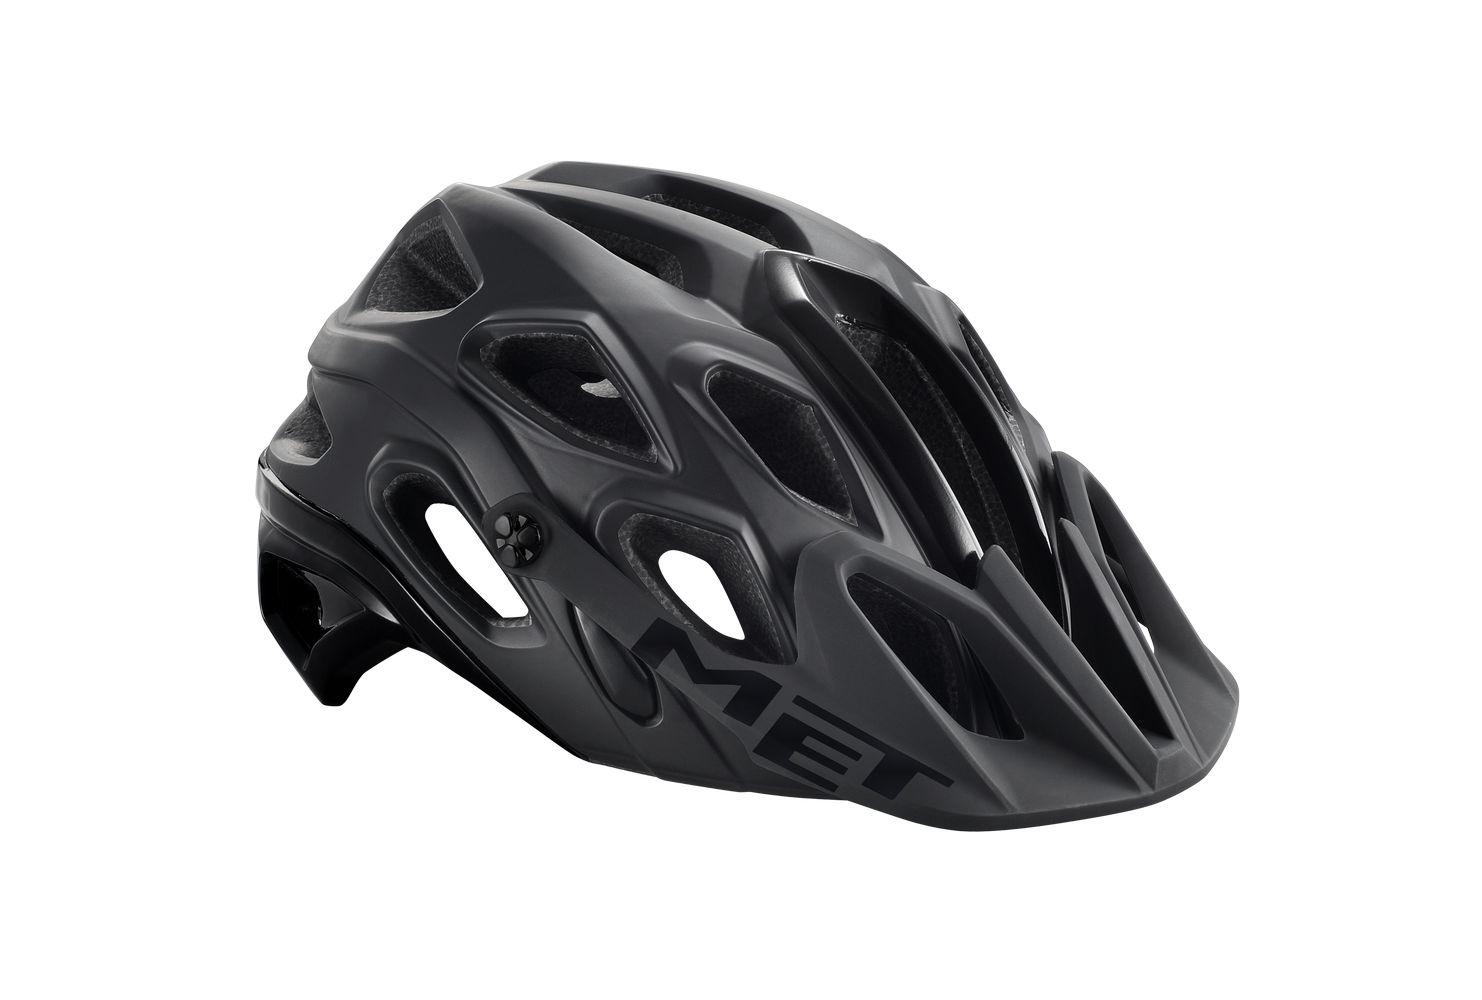 Casque MET Lupo noir - L / 59-62 cm